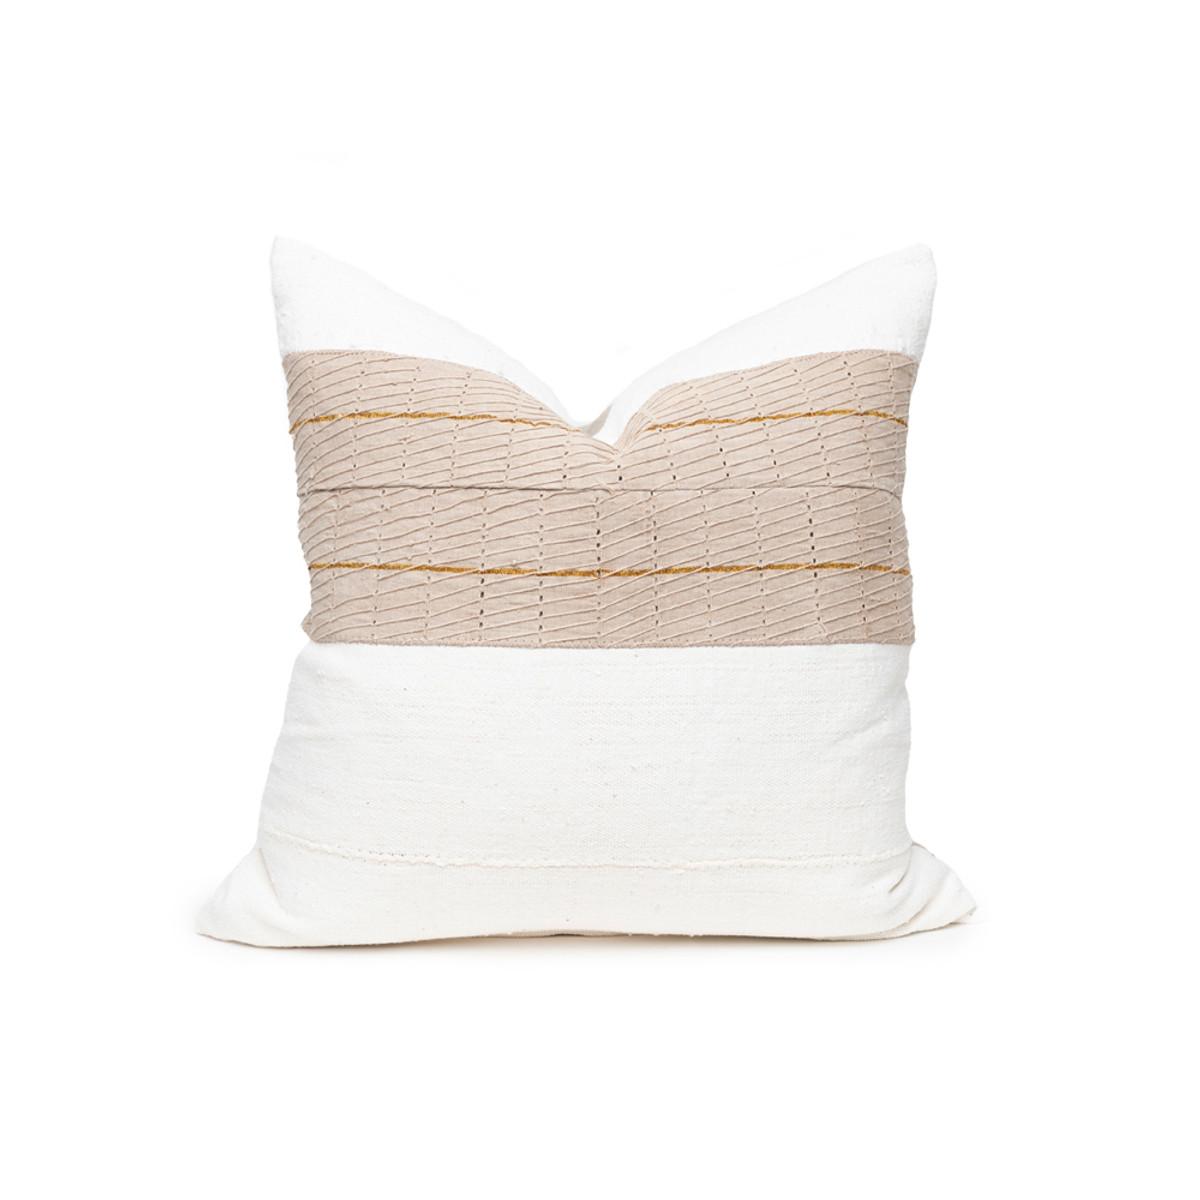 Cora Aso Oke Stripe Ivory Mud Cloth Linen Pillow - Back